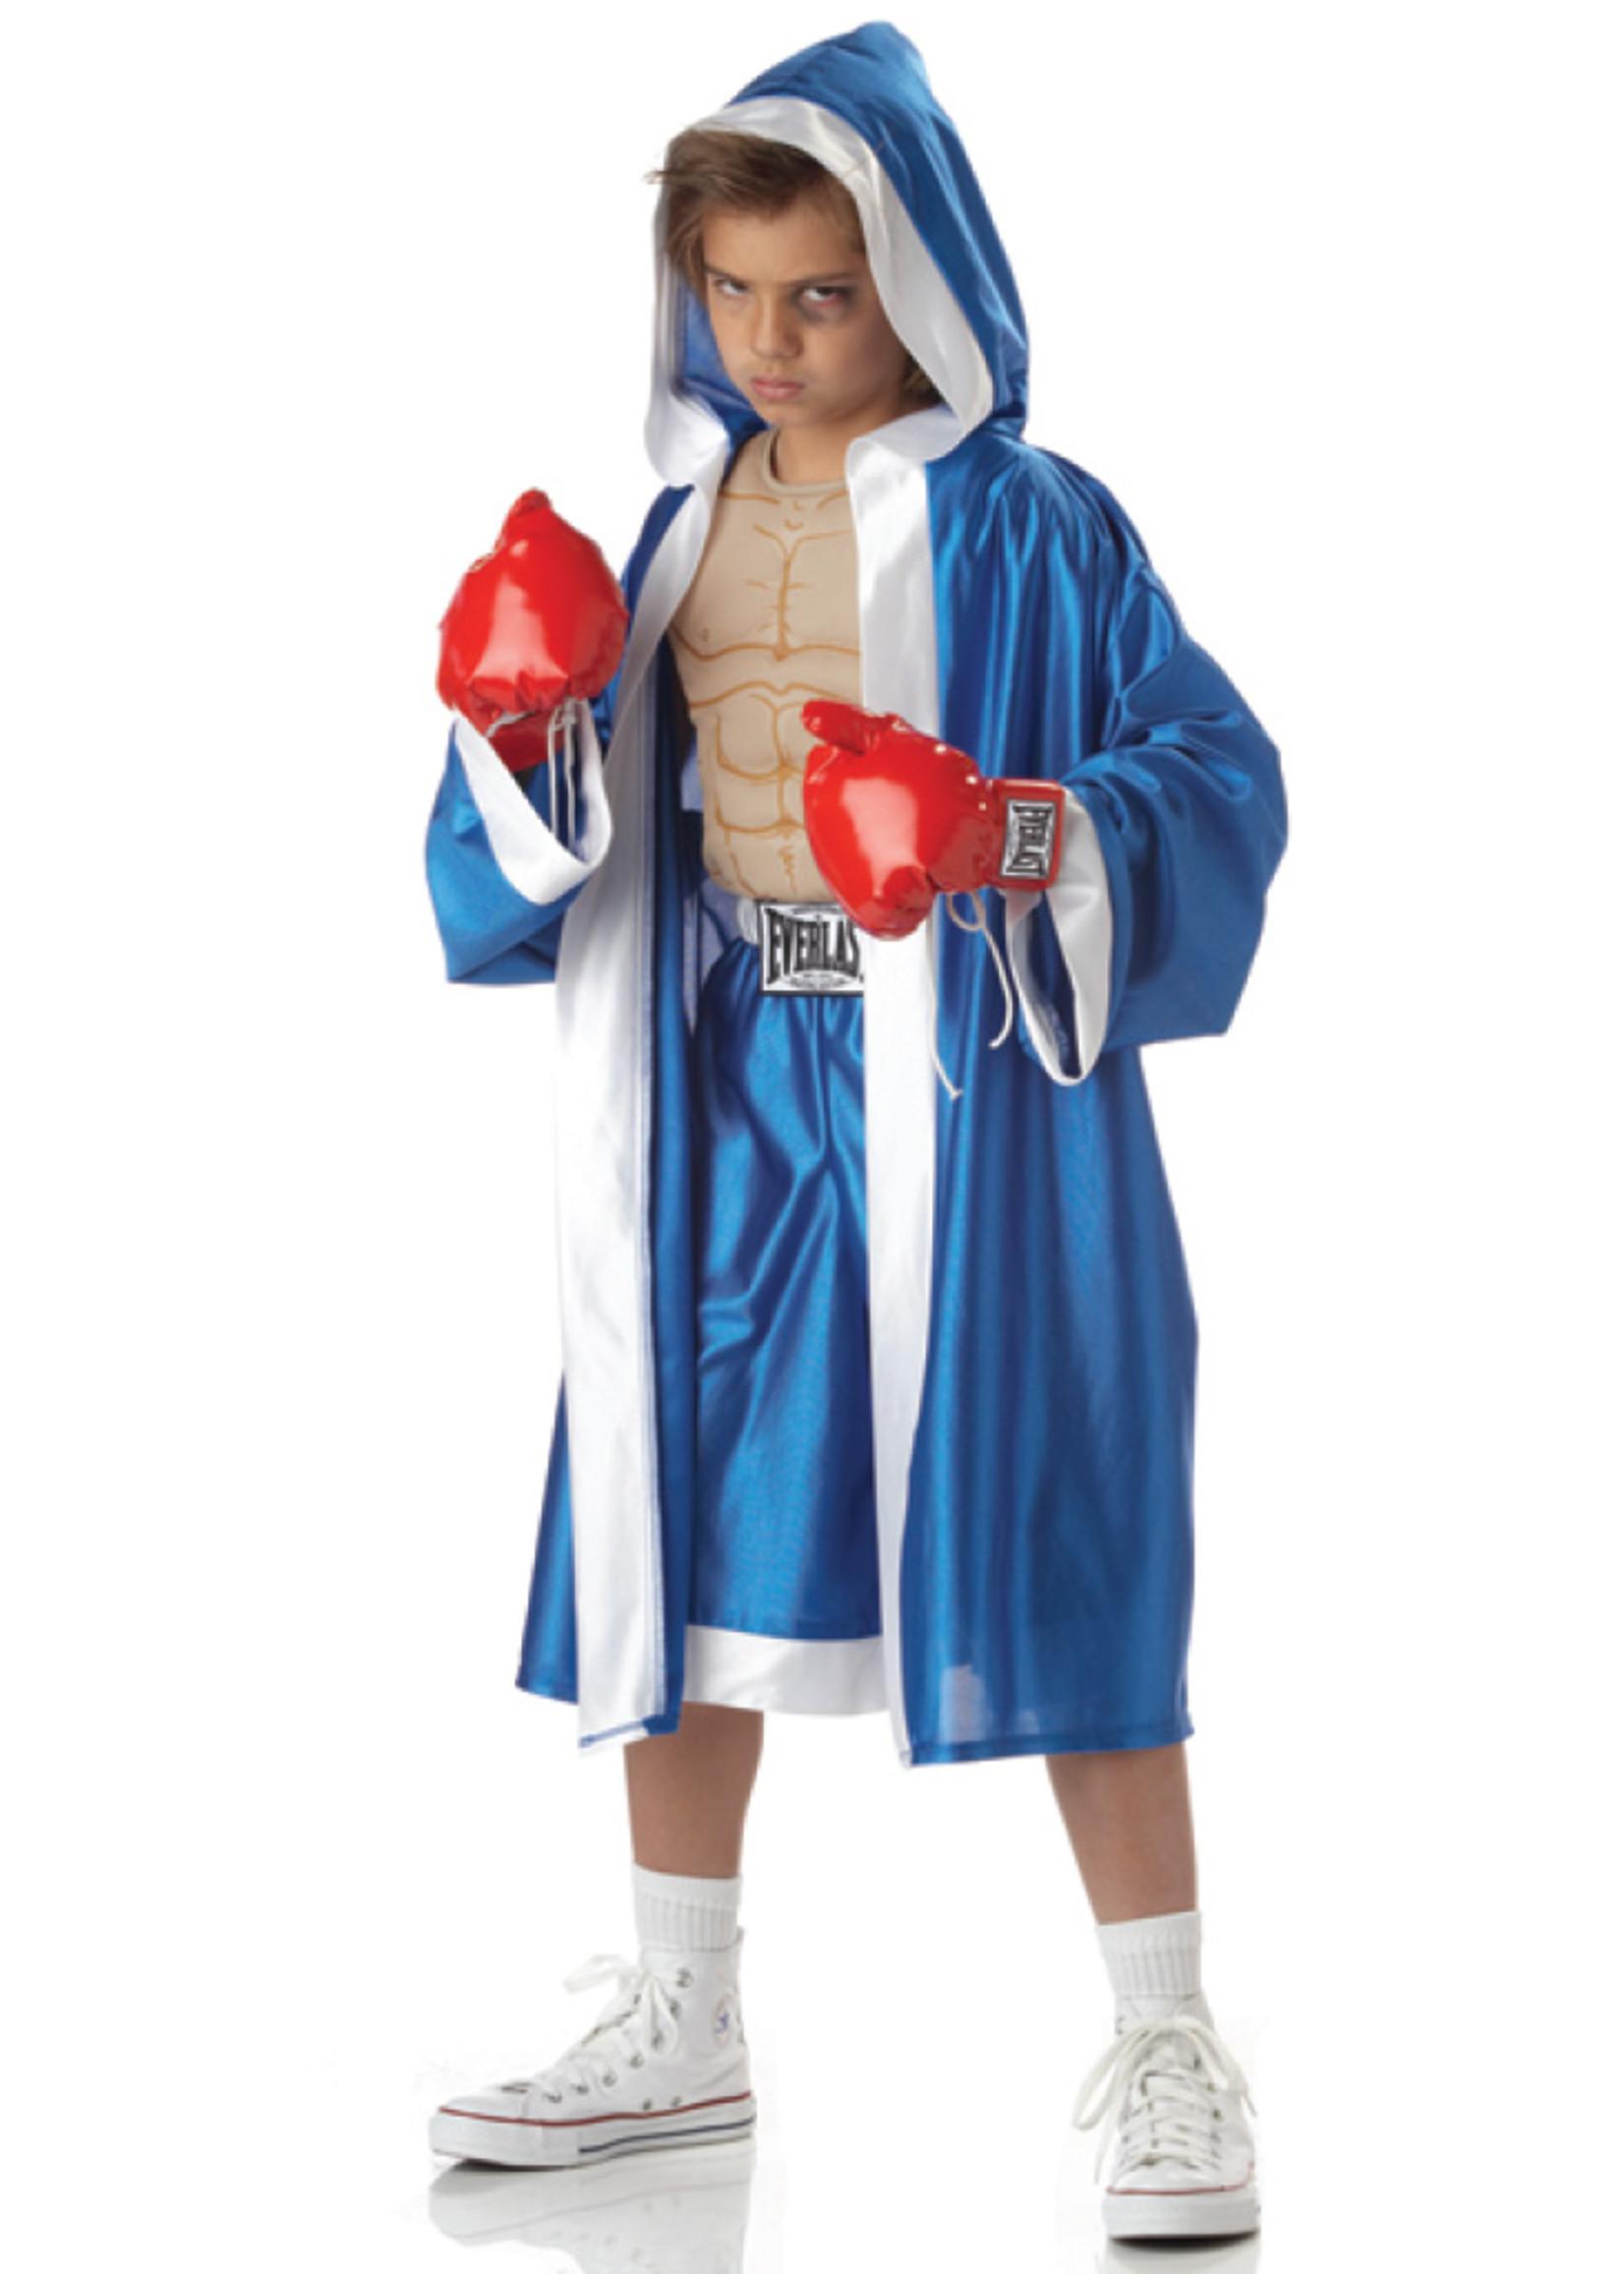 Lil Champ Costume - Boy's